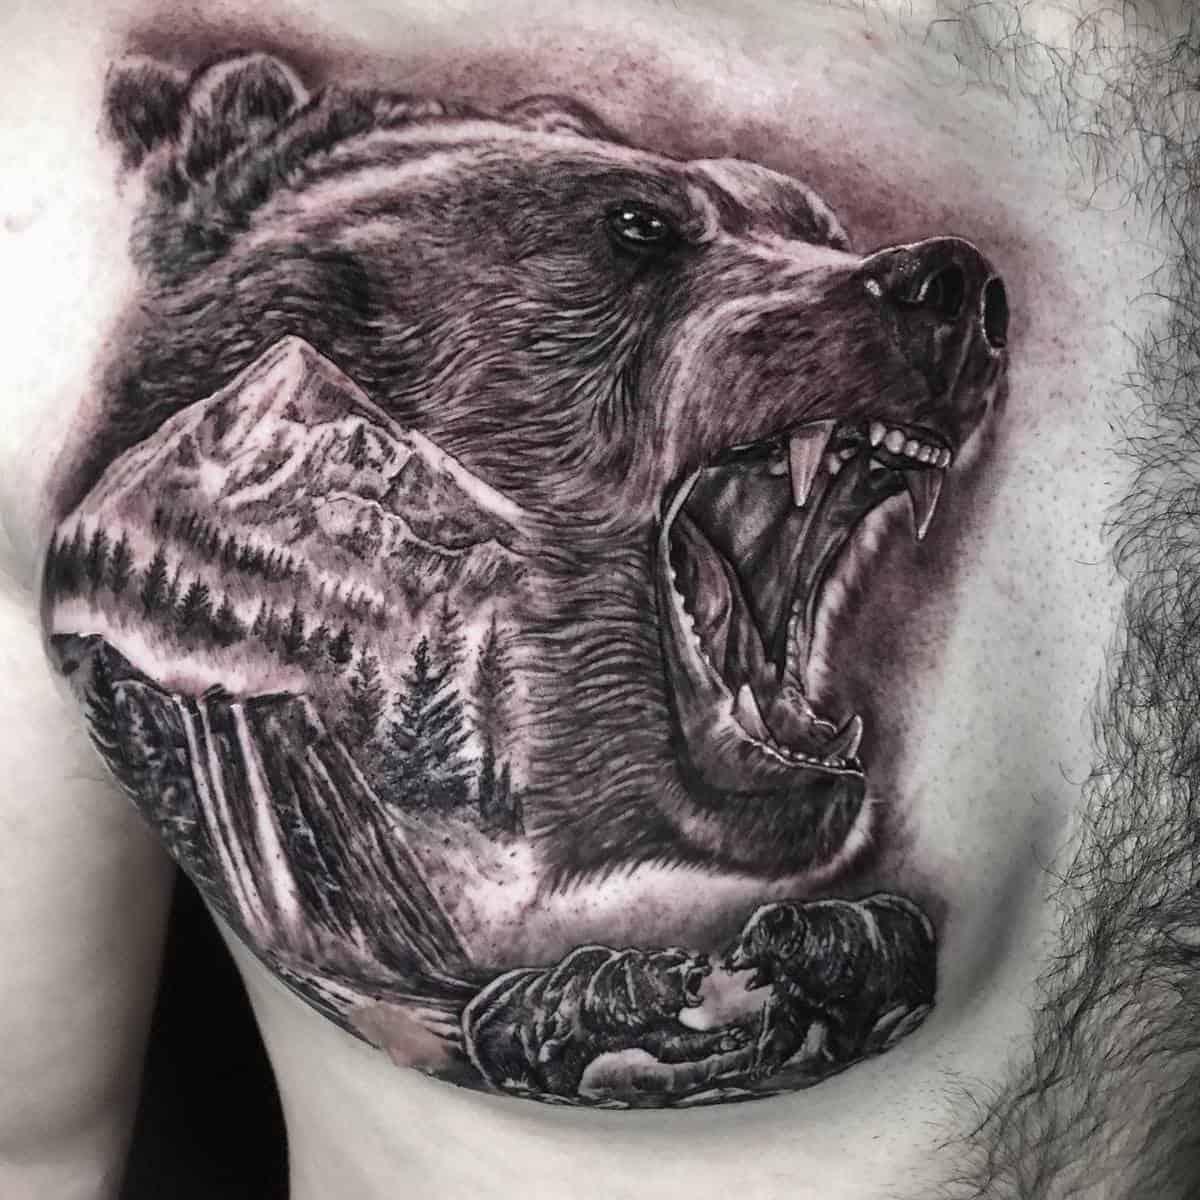 Chest Black Bear Tattoo javiereastman